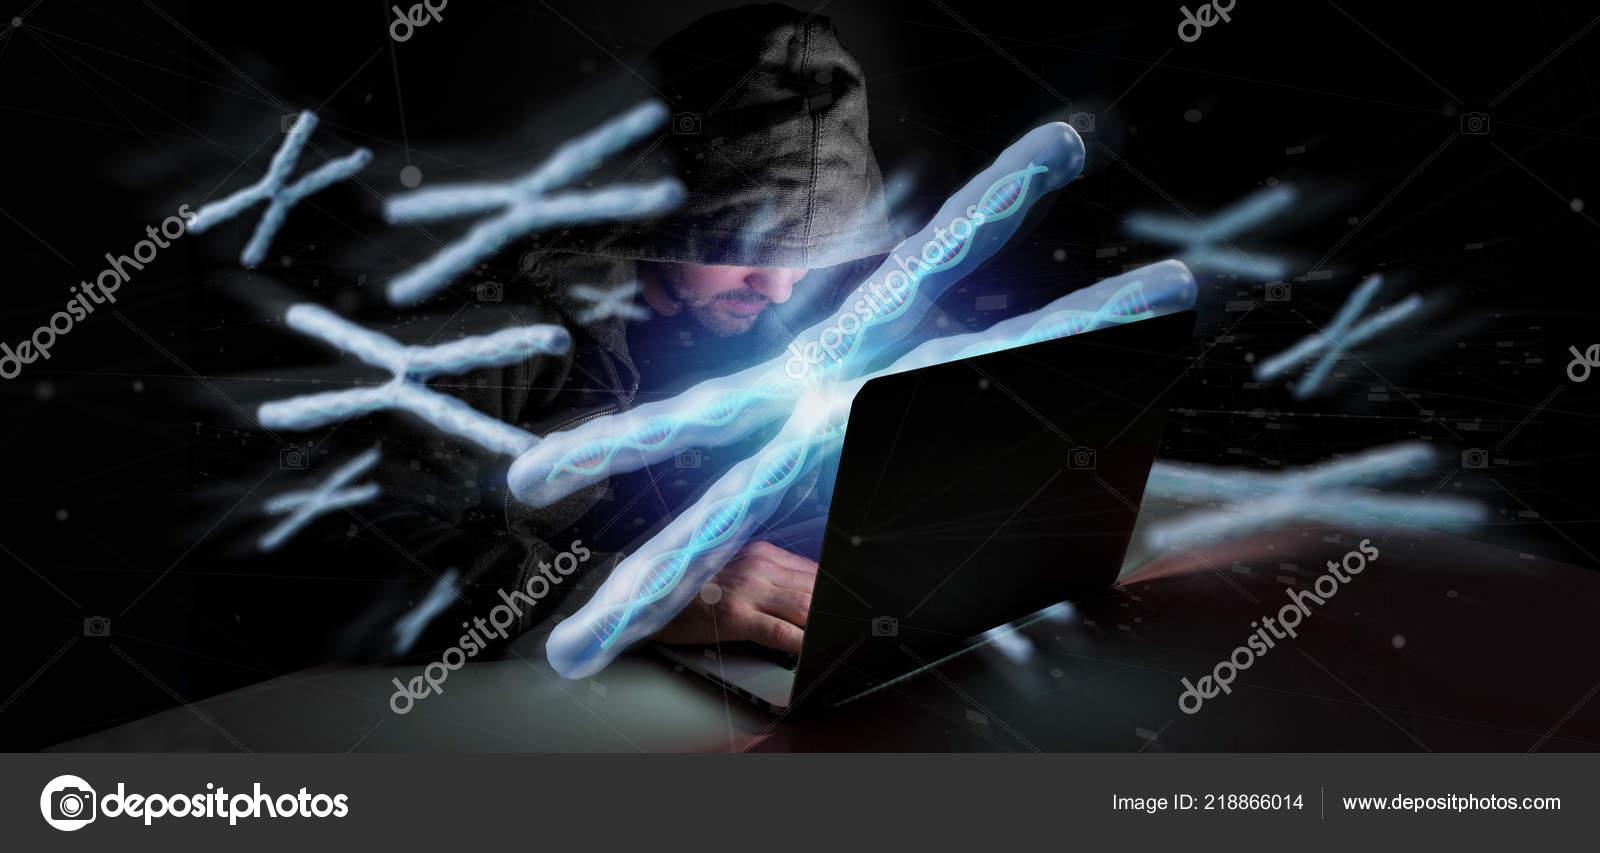 Desktop Wallpaper Chromosome View Man Hacking Group